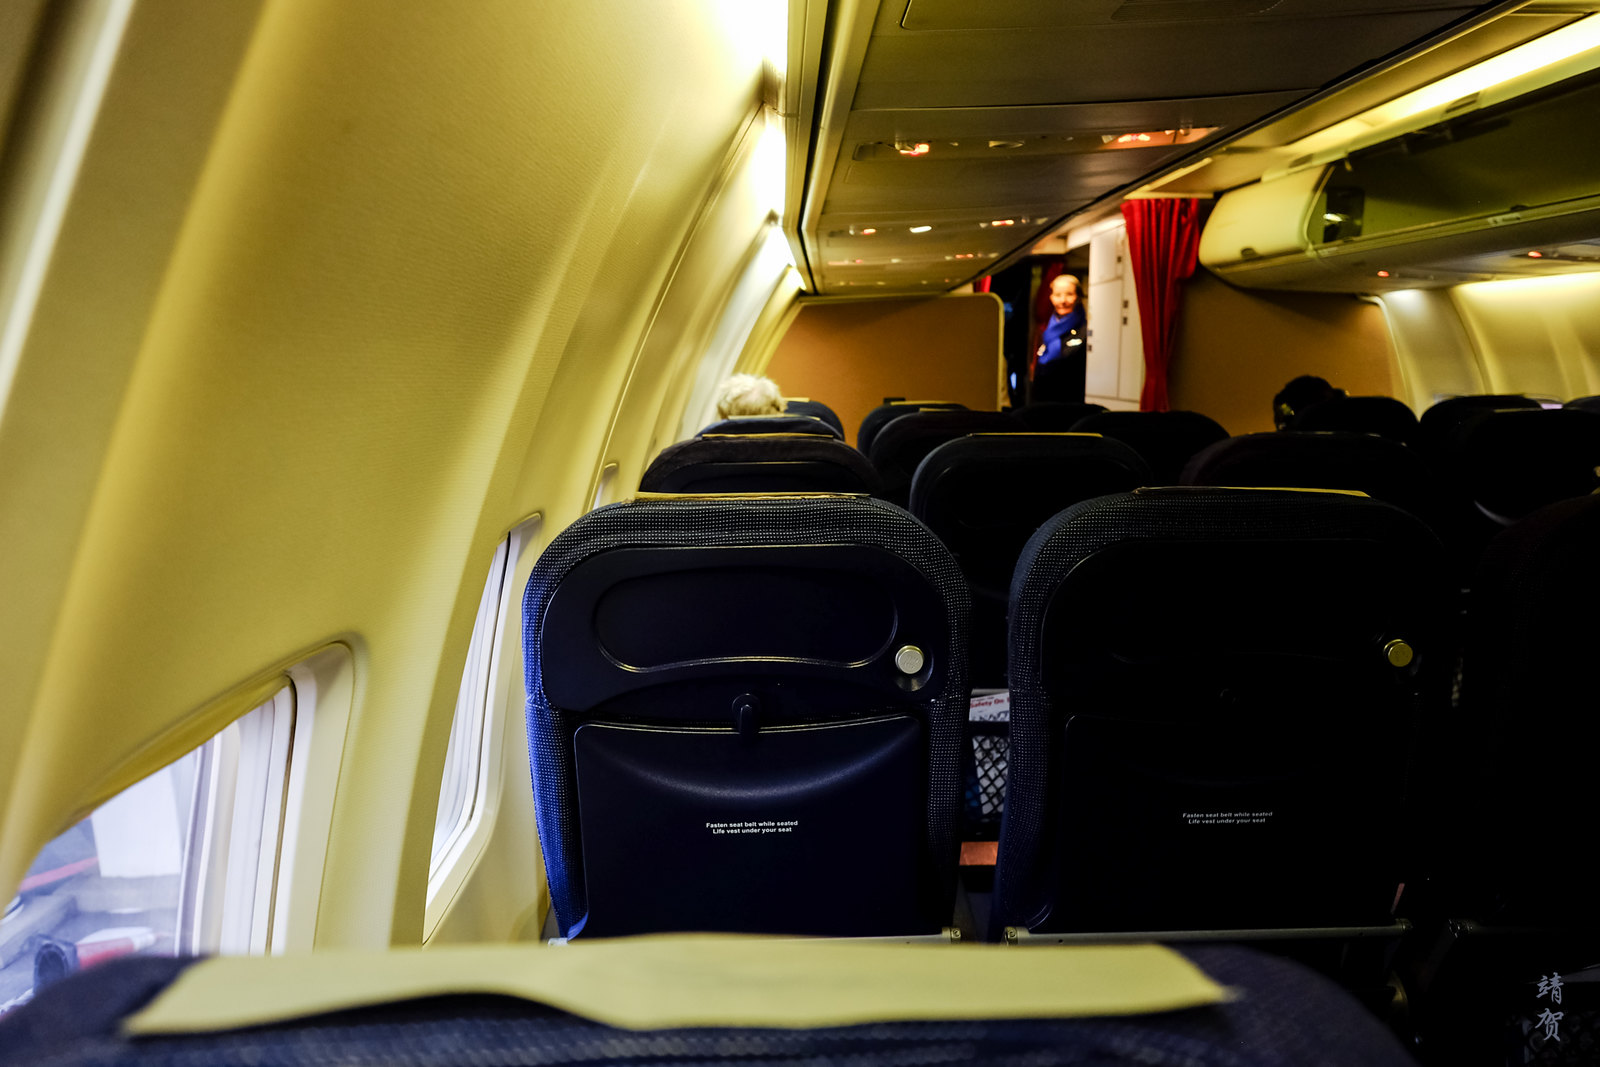 Onboard SAS 737-700